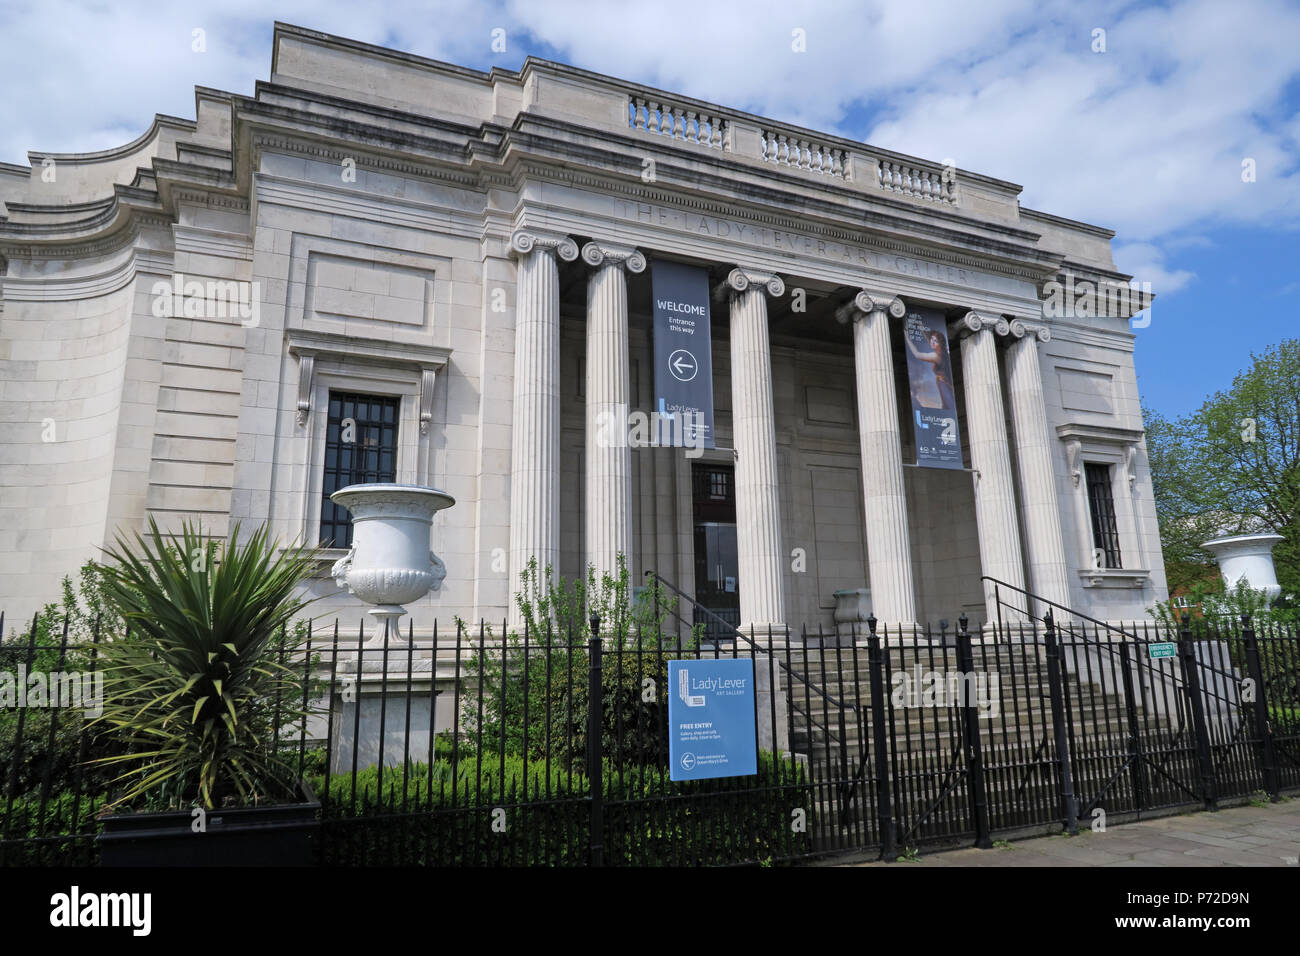 Laden Sie dieses Alamy Stockfoto Lady Hebel Art Gallery, Port Sunlight Village, untere Rd, Bebington, Wirral, North West England, UK, CH62 5EQ - P72D9N